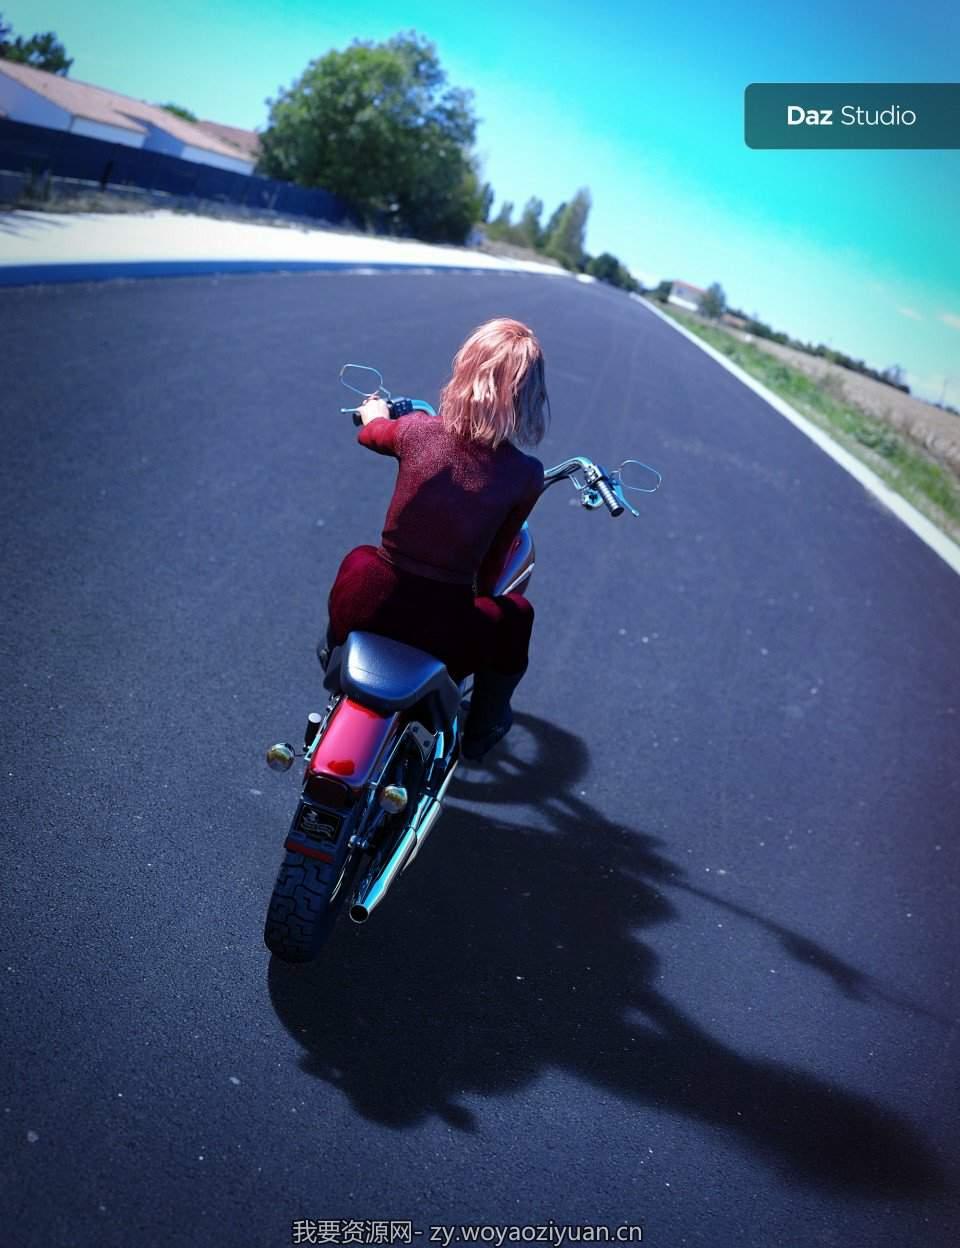 UltraHD Iray HDRI With DOF – The Road